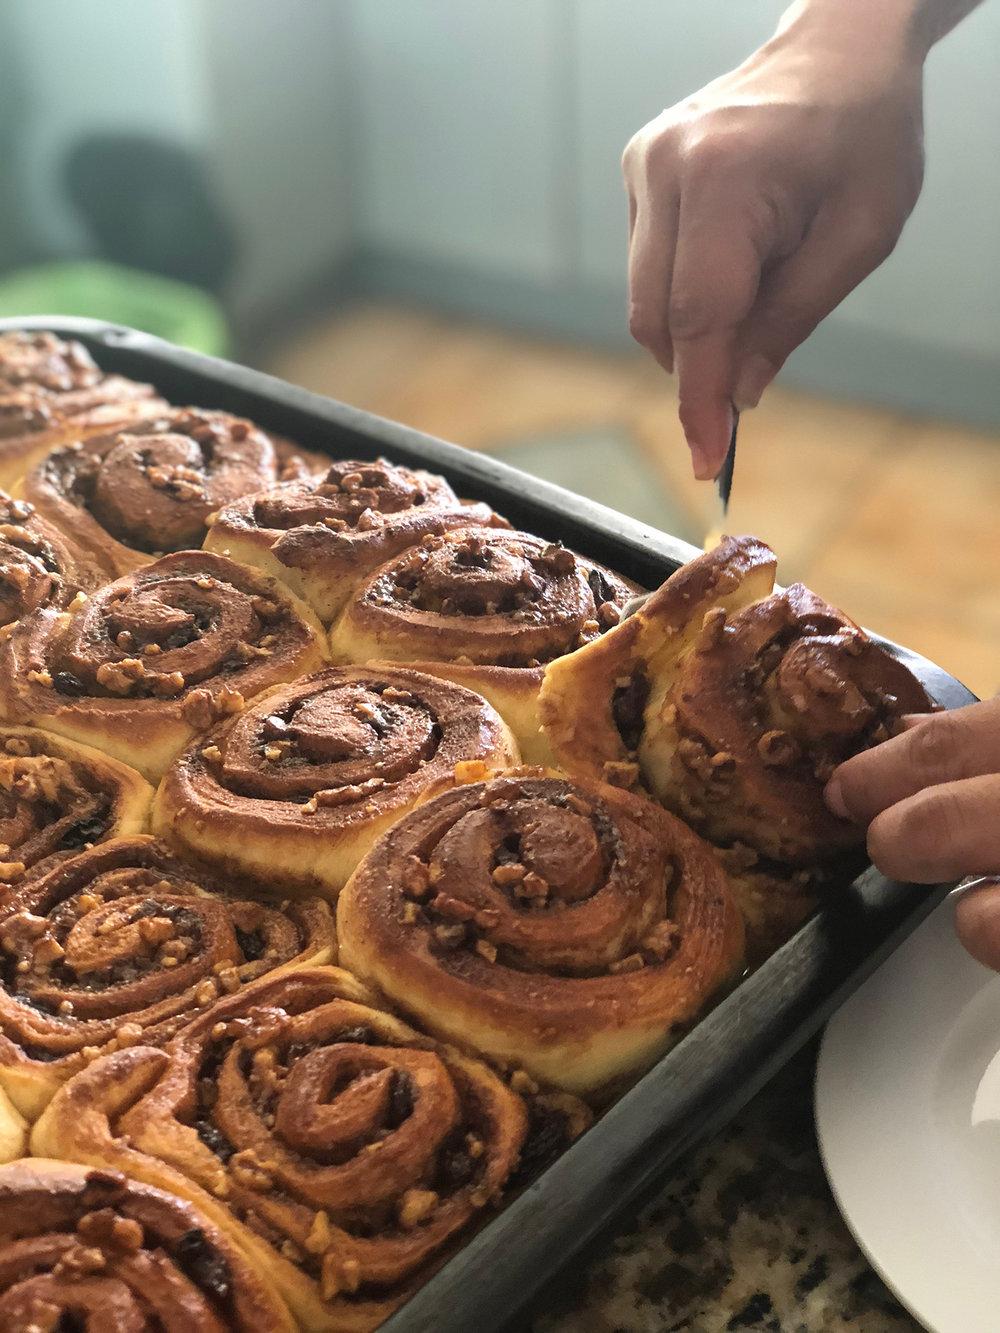 Doyet's baking